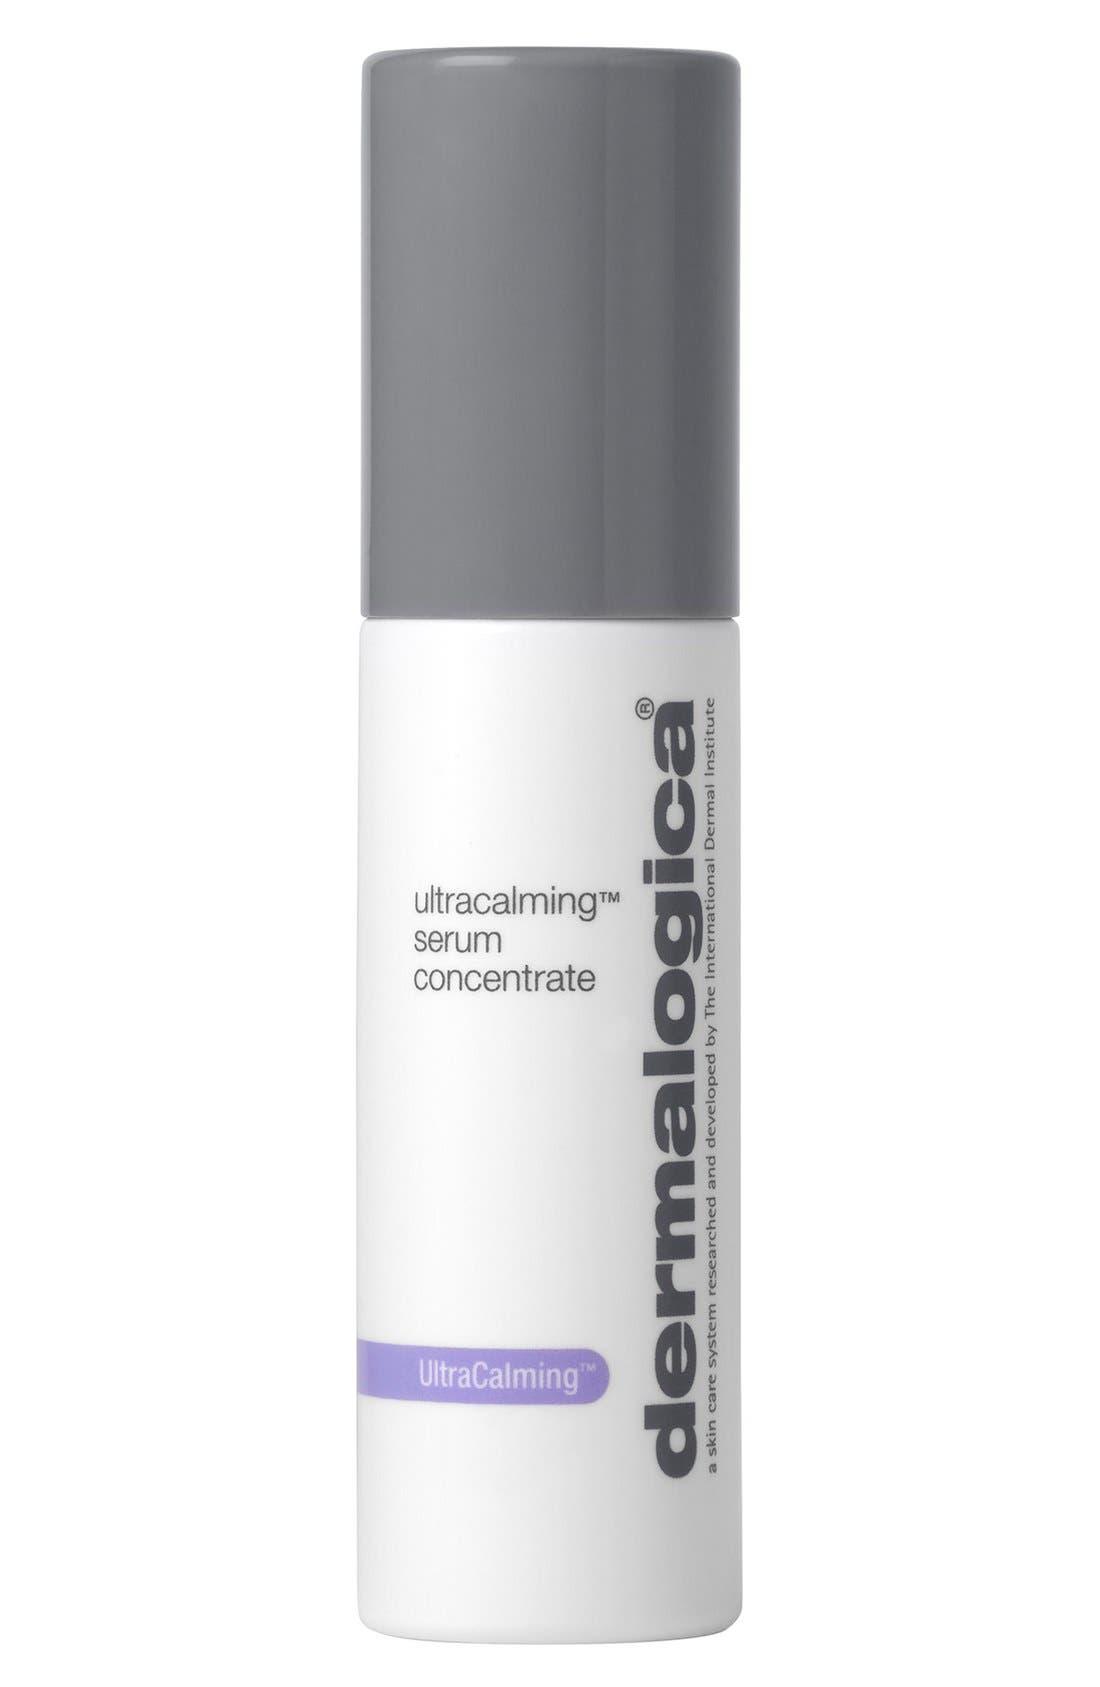 dermalogica® UltraCalming™ Serum Concentrate